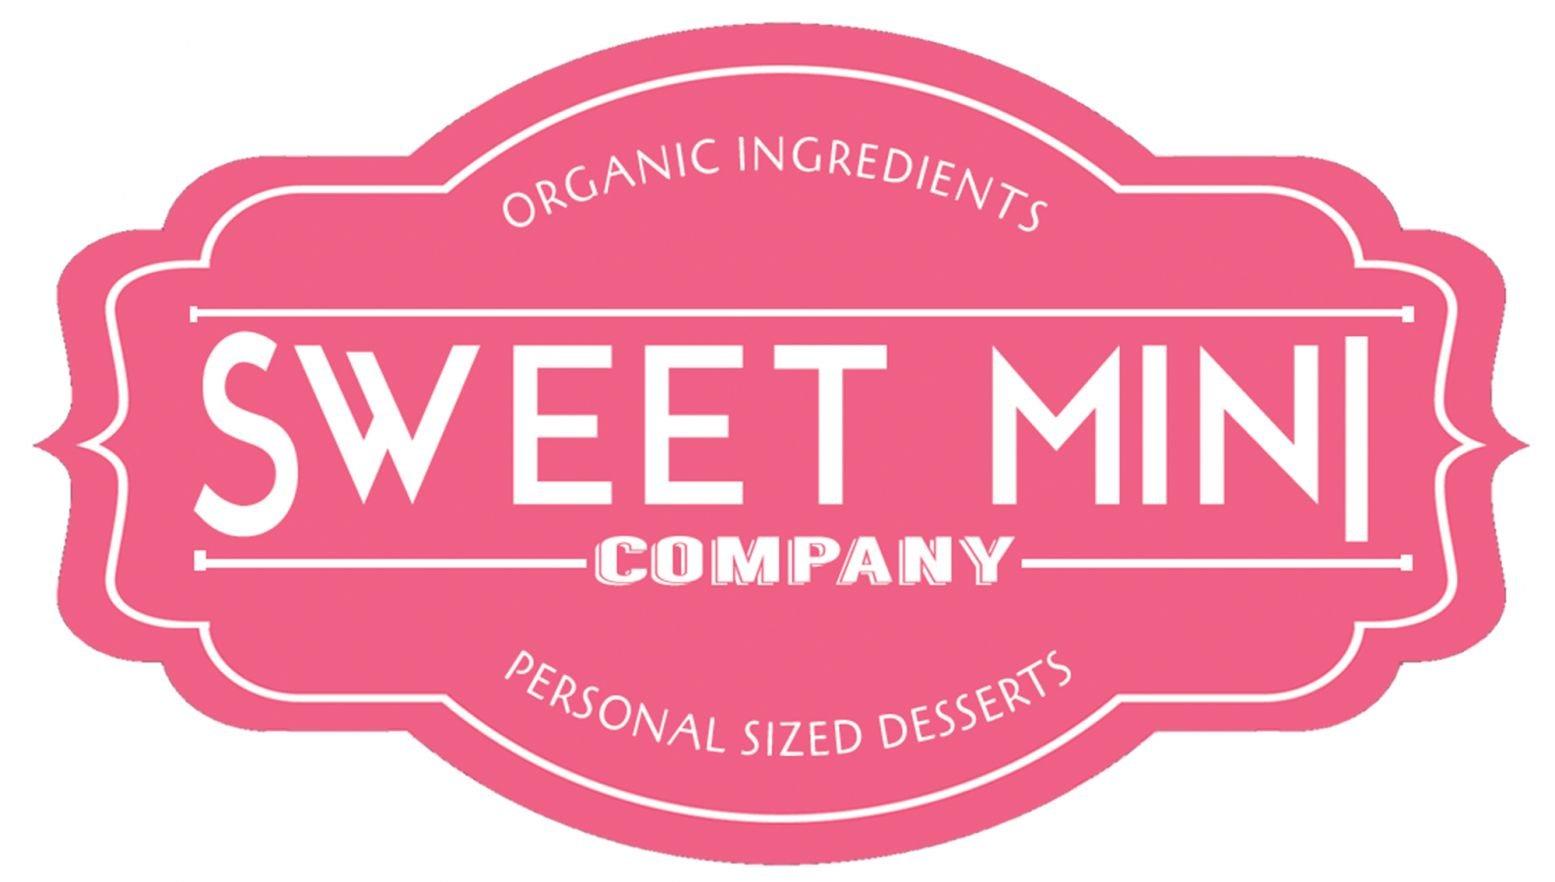 Sweet Mini Company